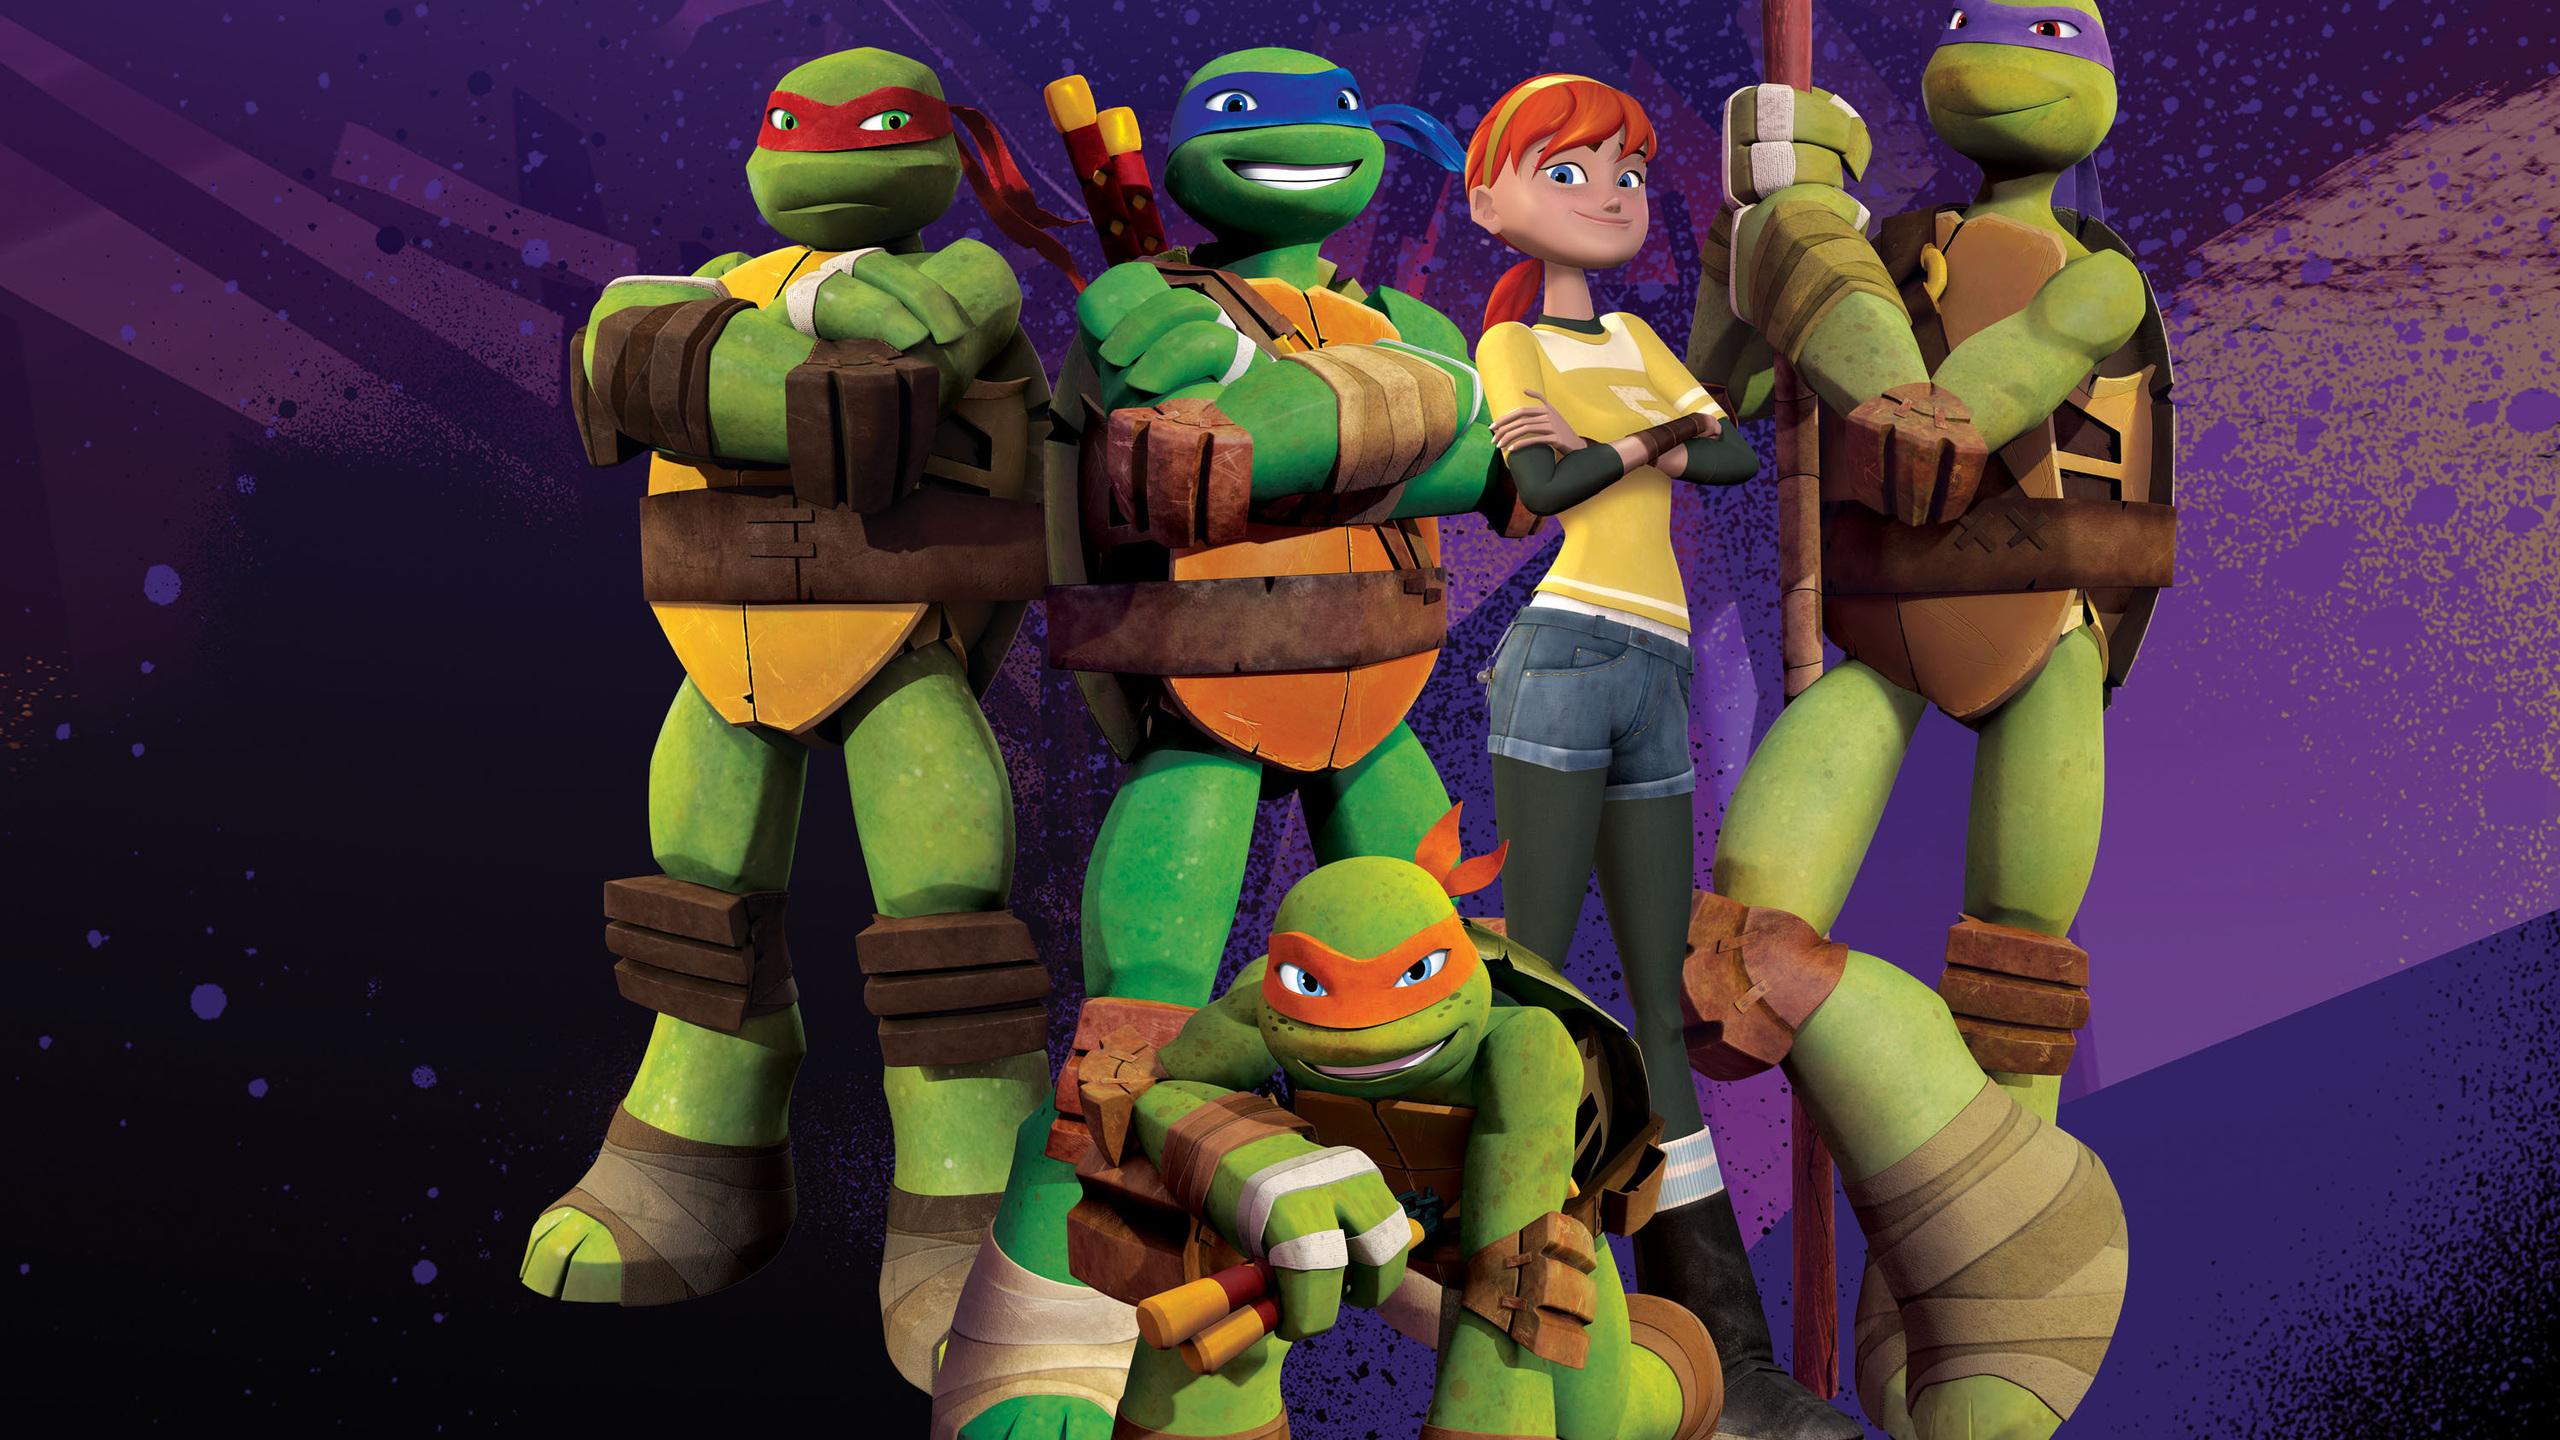 Ninja Turtle Wallpaper Hd Posted By John Johnson